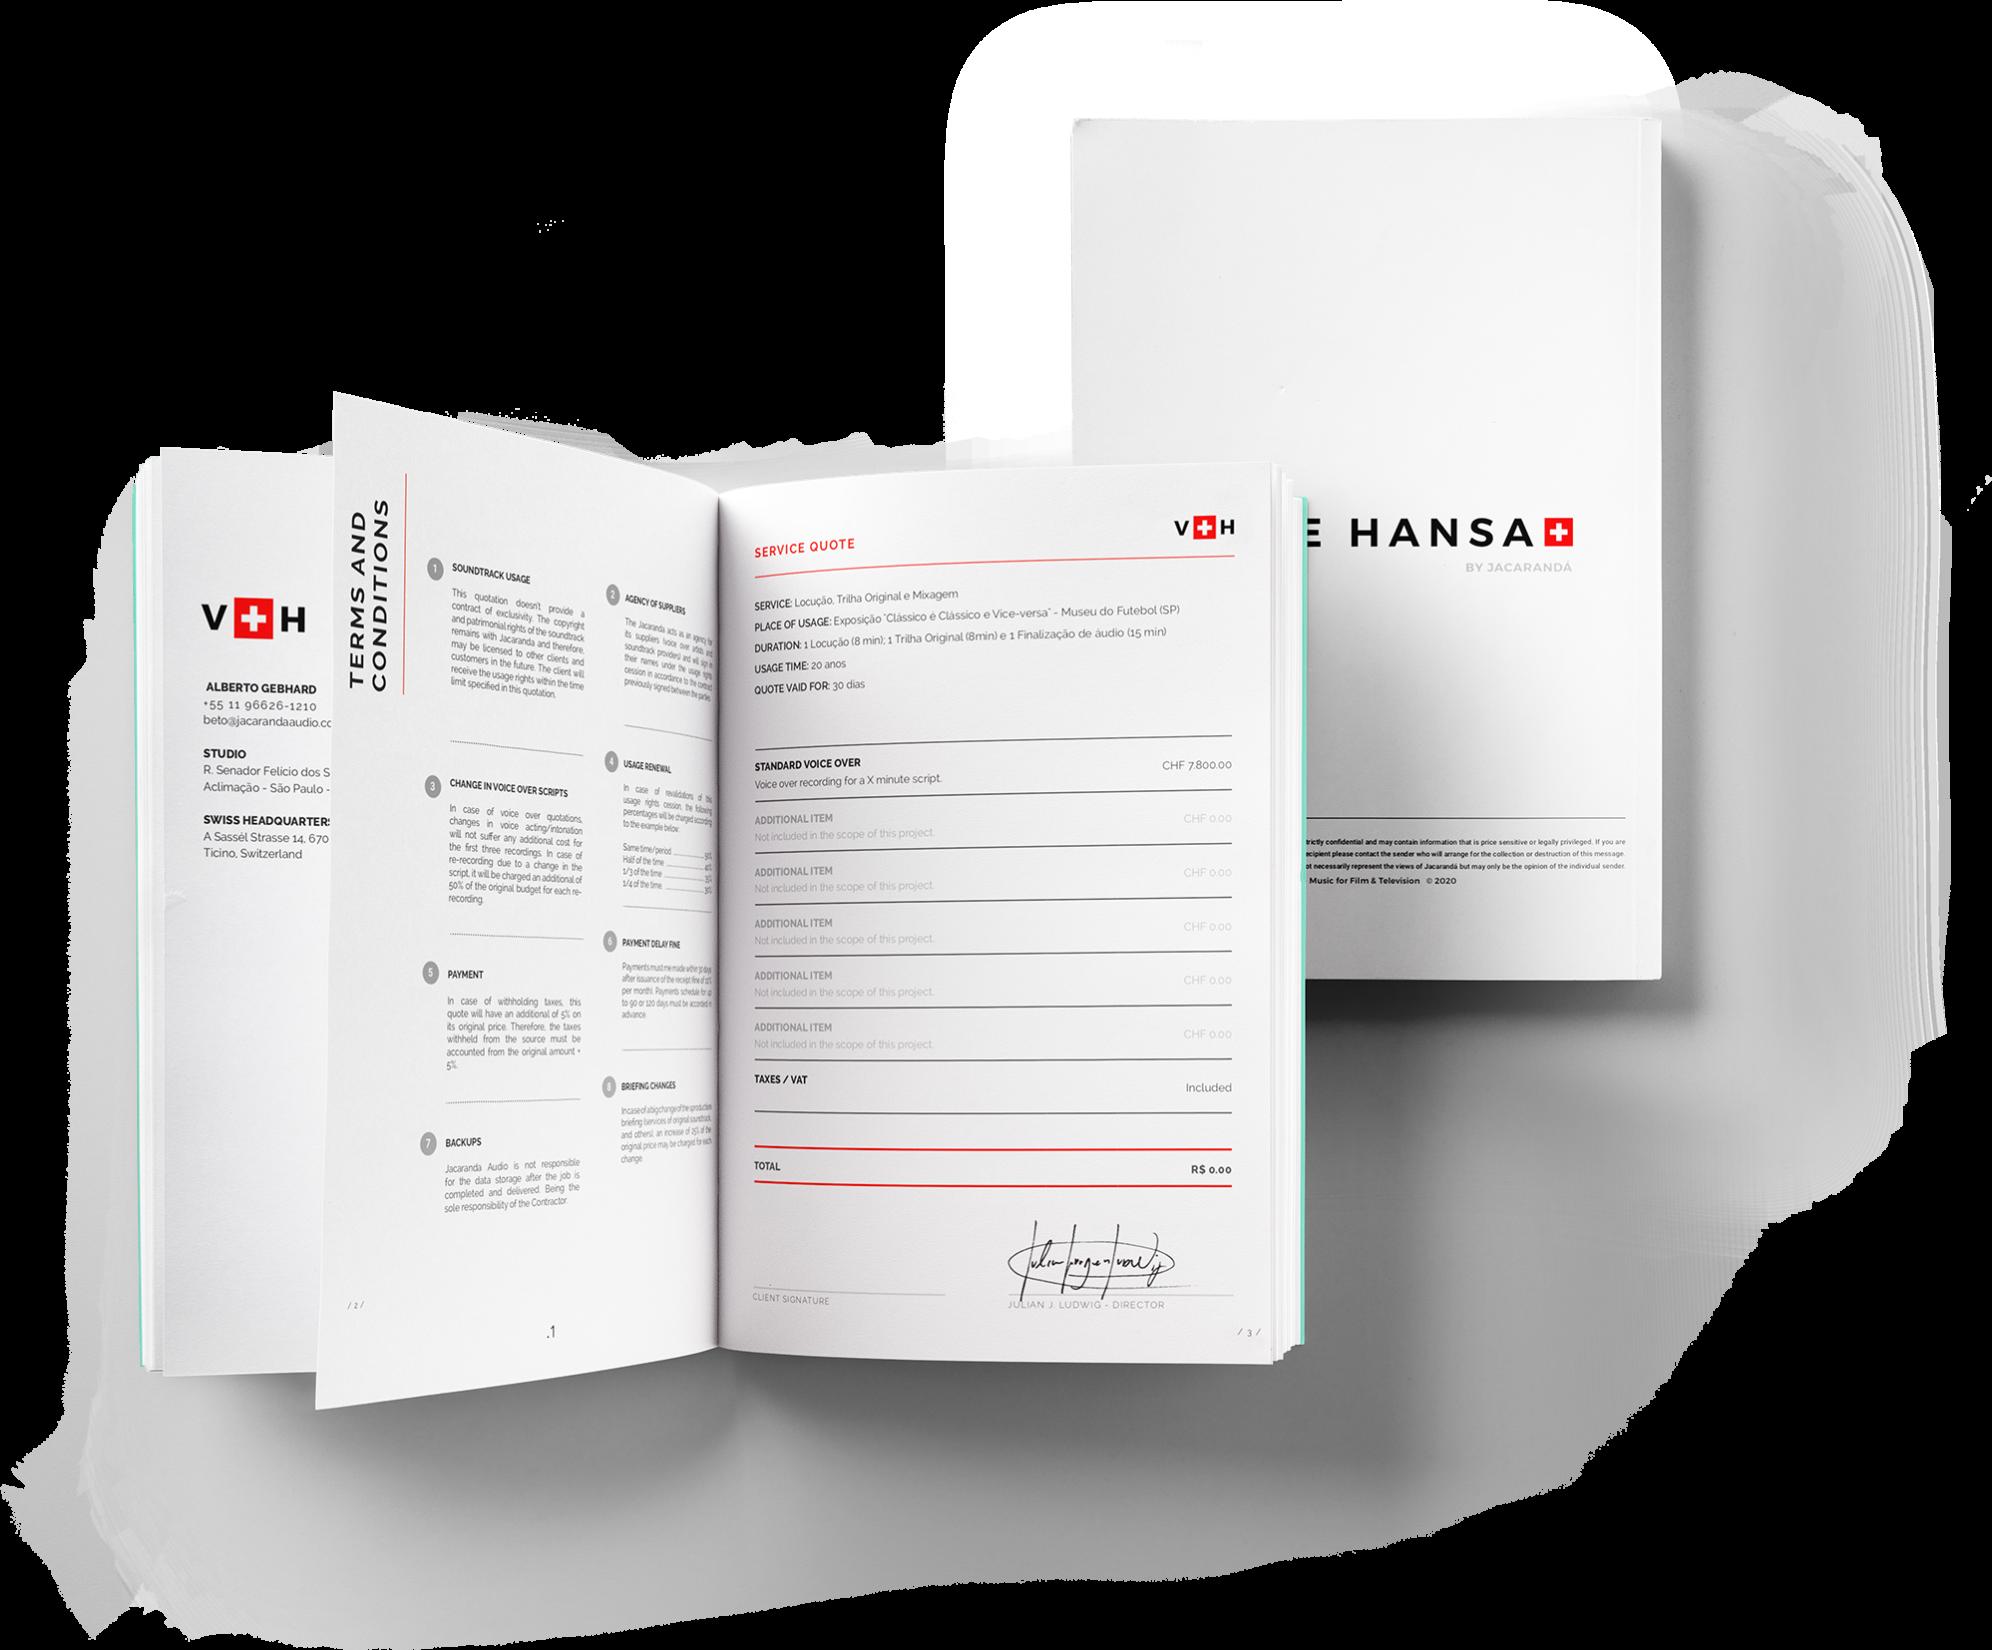 Voice Hansa - Voice-over Agency based in Switzerland